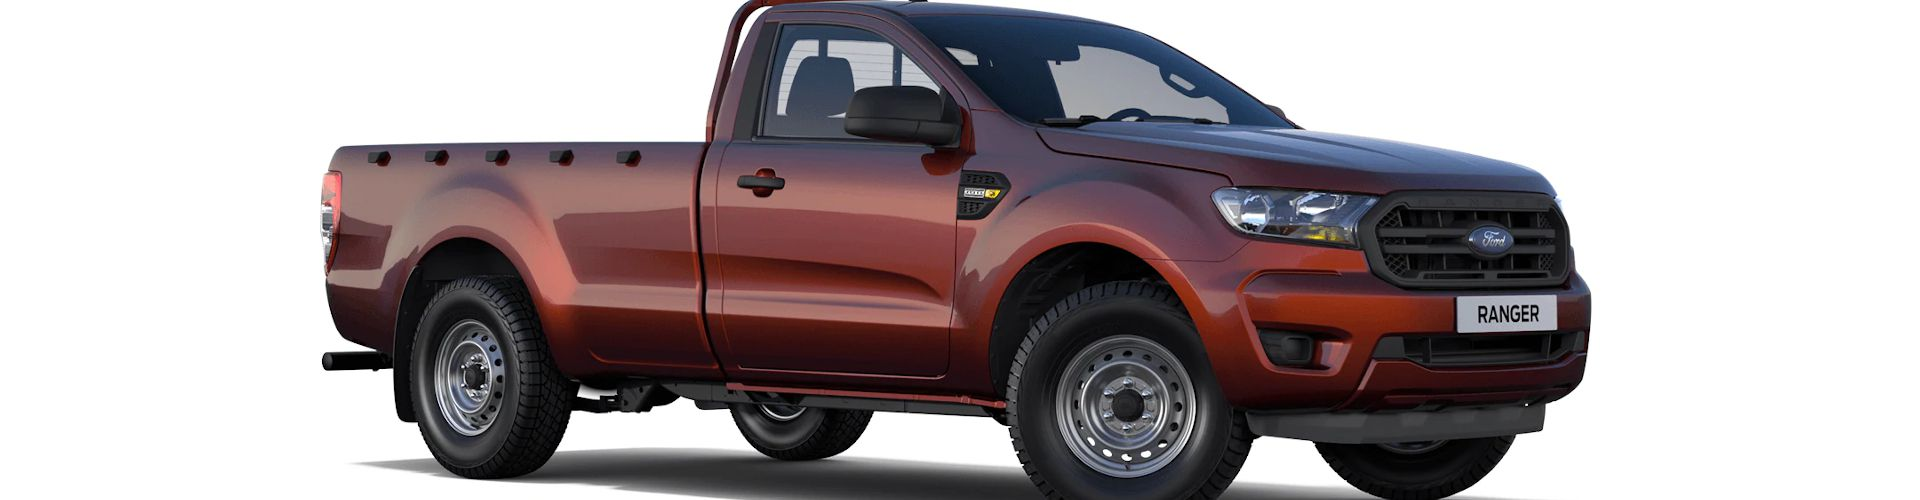 Ford Ranger XL - Α. Λιάπης Αντιπροσωπεία